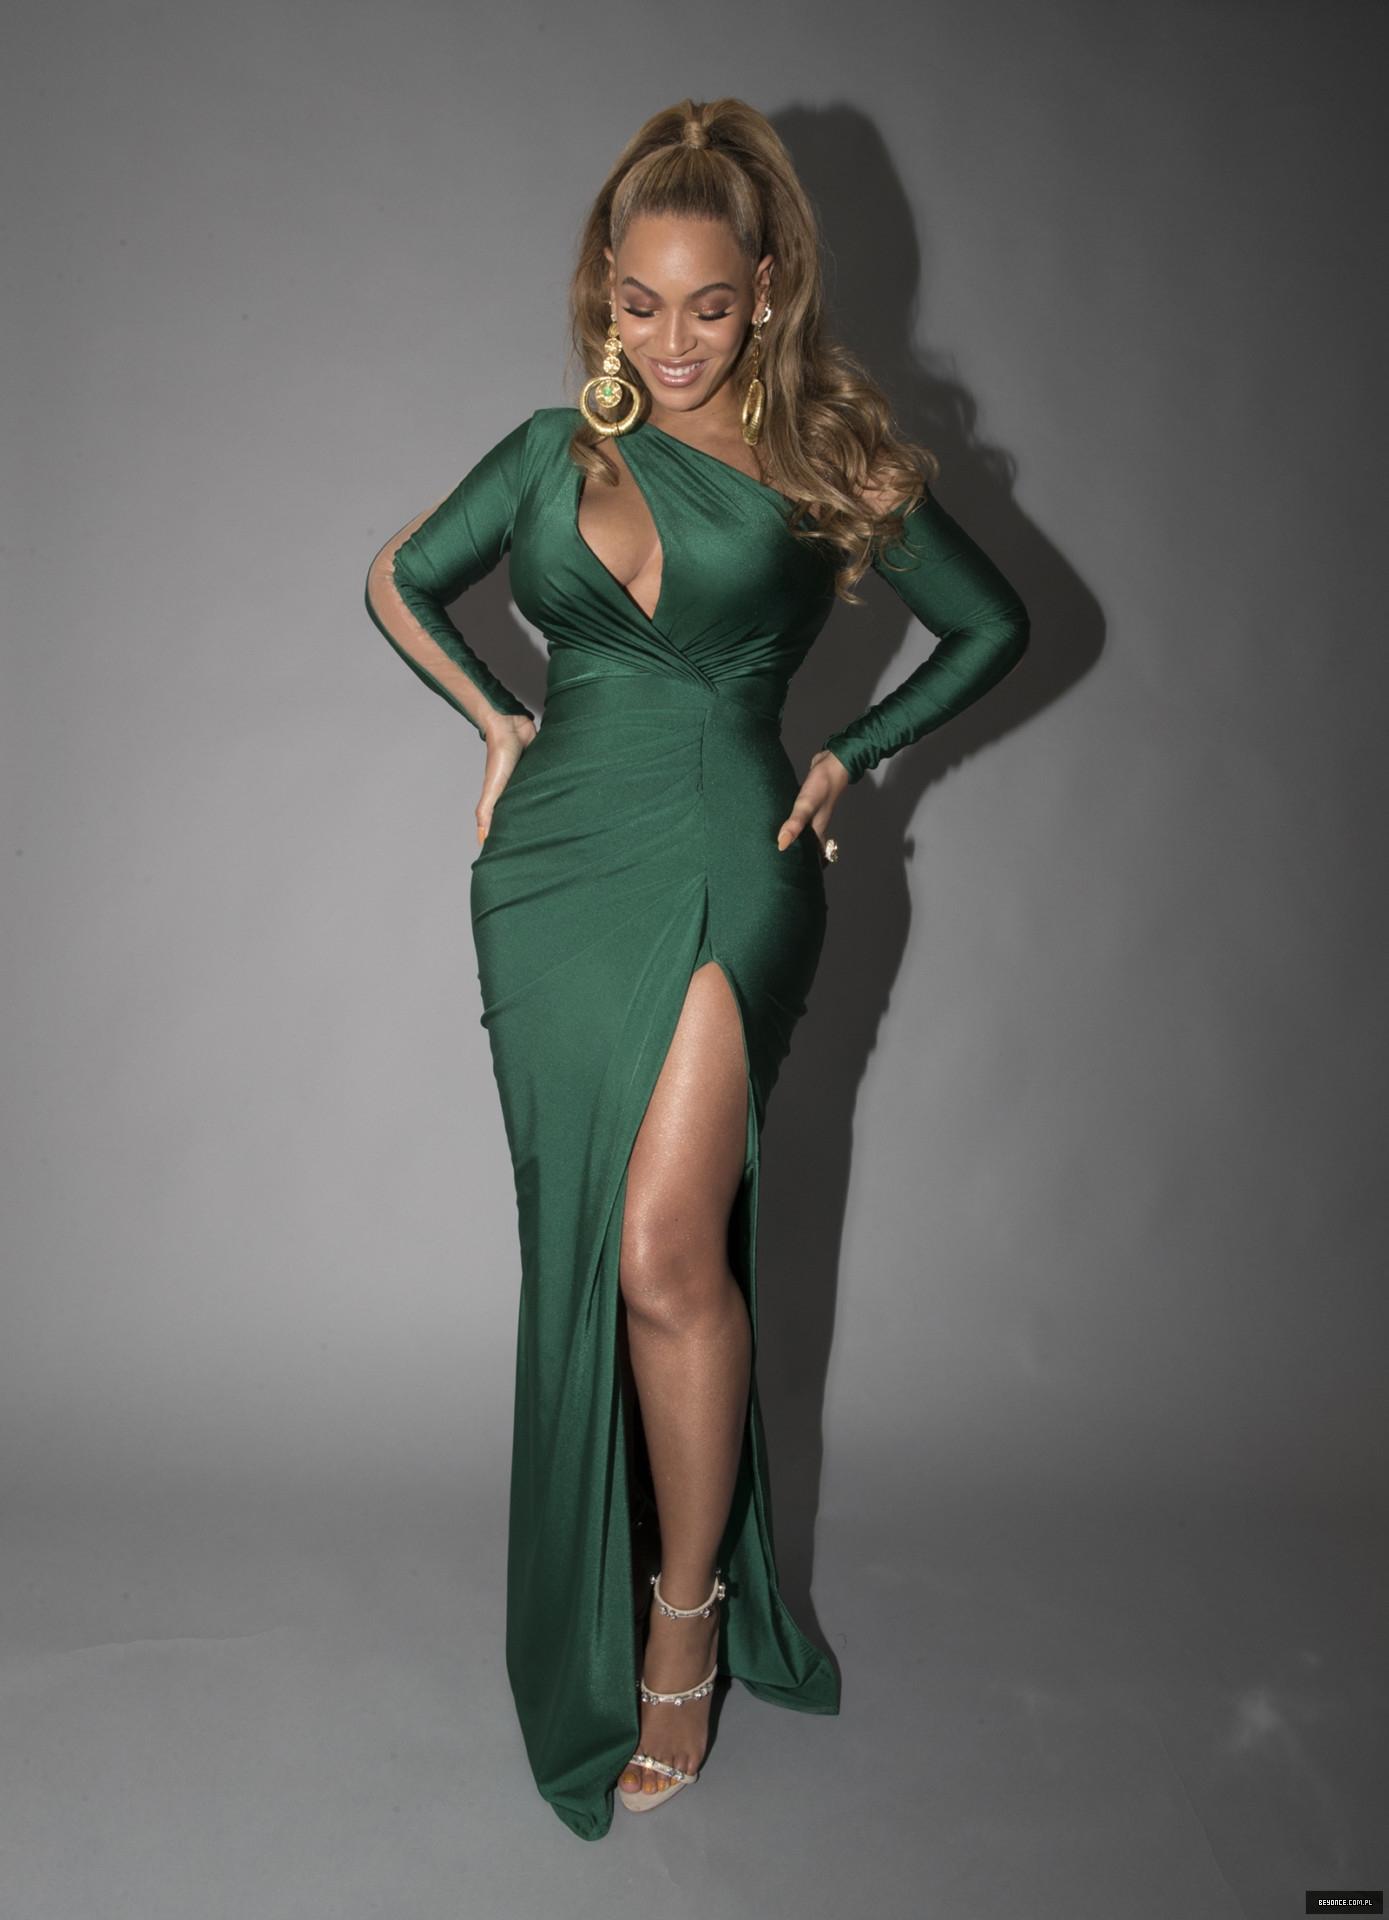 Beyoncé - Twitter (@Beyonce), Instagram (Baddiebey), Tumblr (I Am...) [II] - Página 17 1%7E5